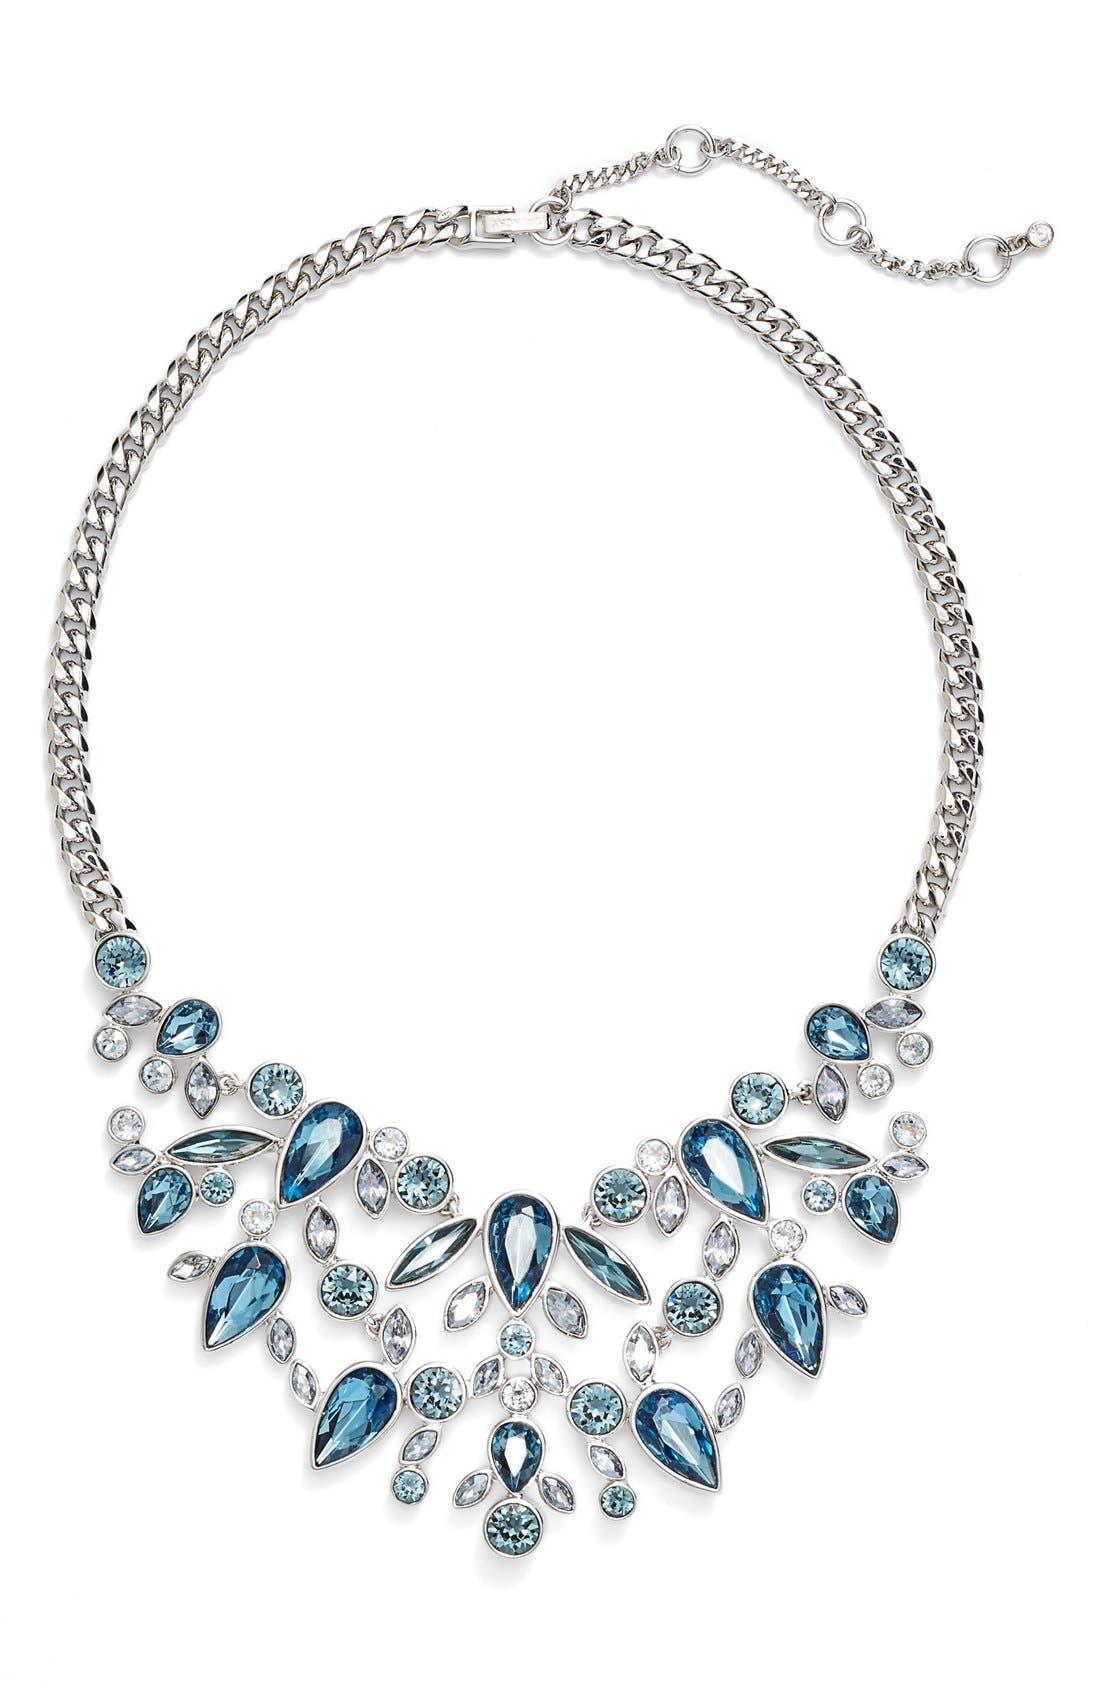 Alternate Image 1 Selected - Givenchy 'Drama' Bib Necklace